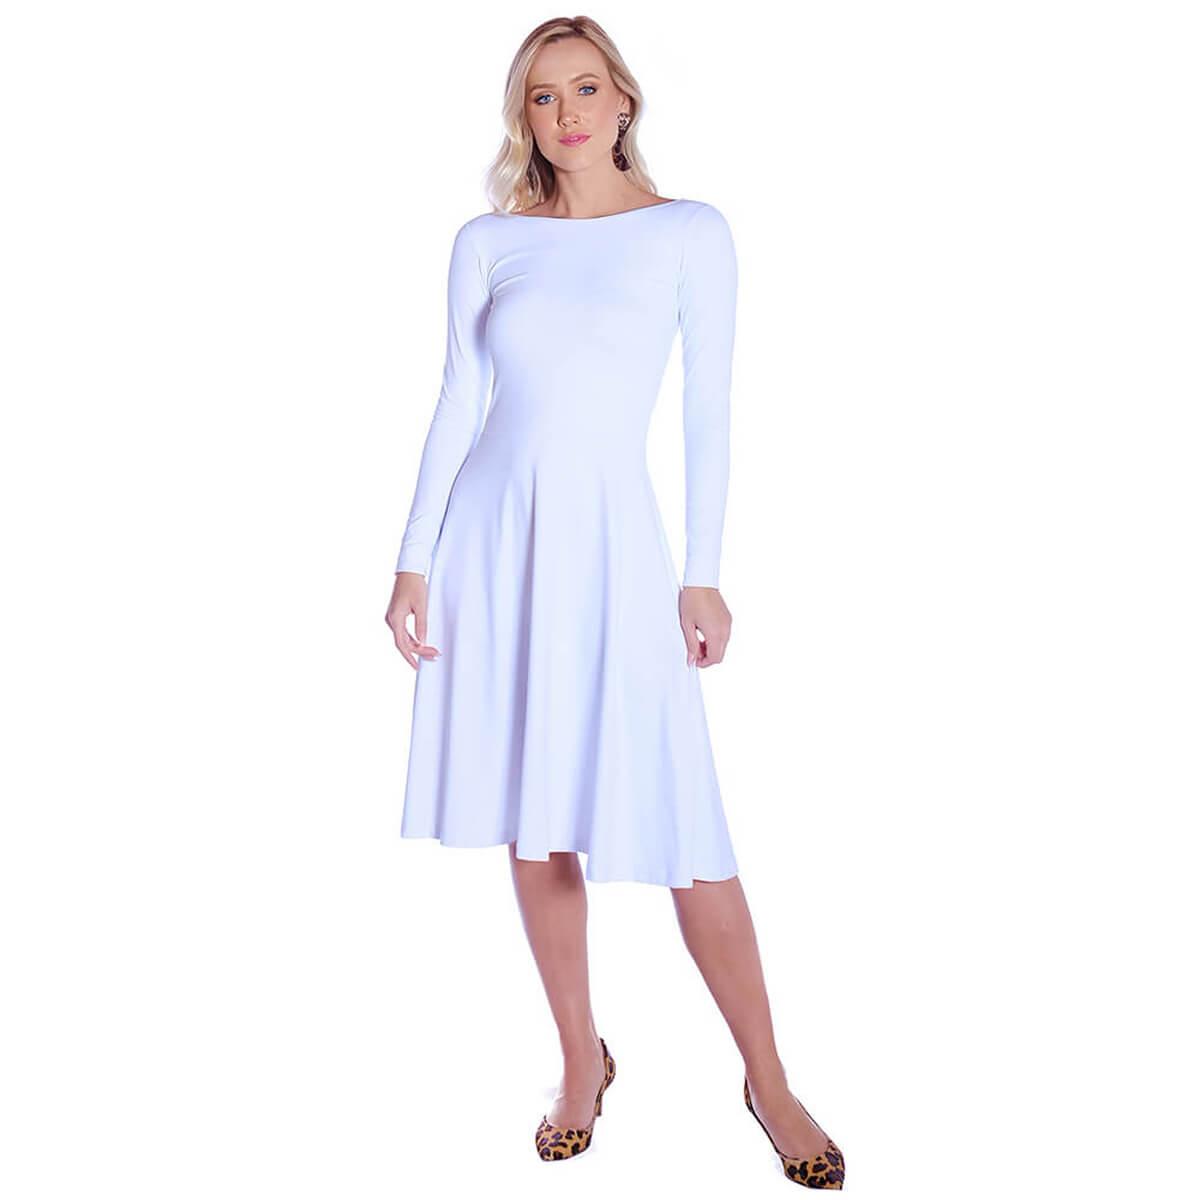 Vestido Branco FICALINDA Manga Longa Decote Canoa